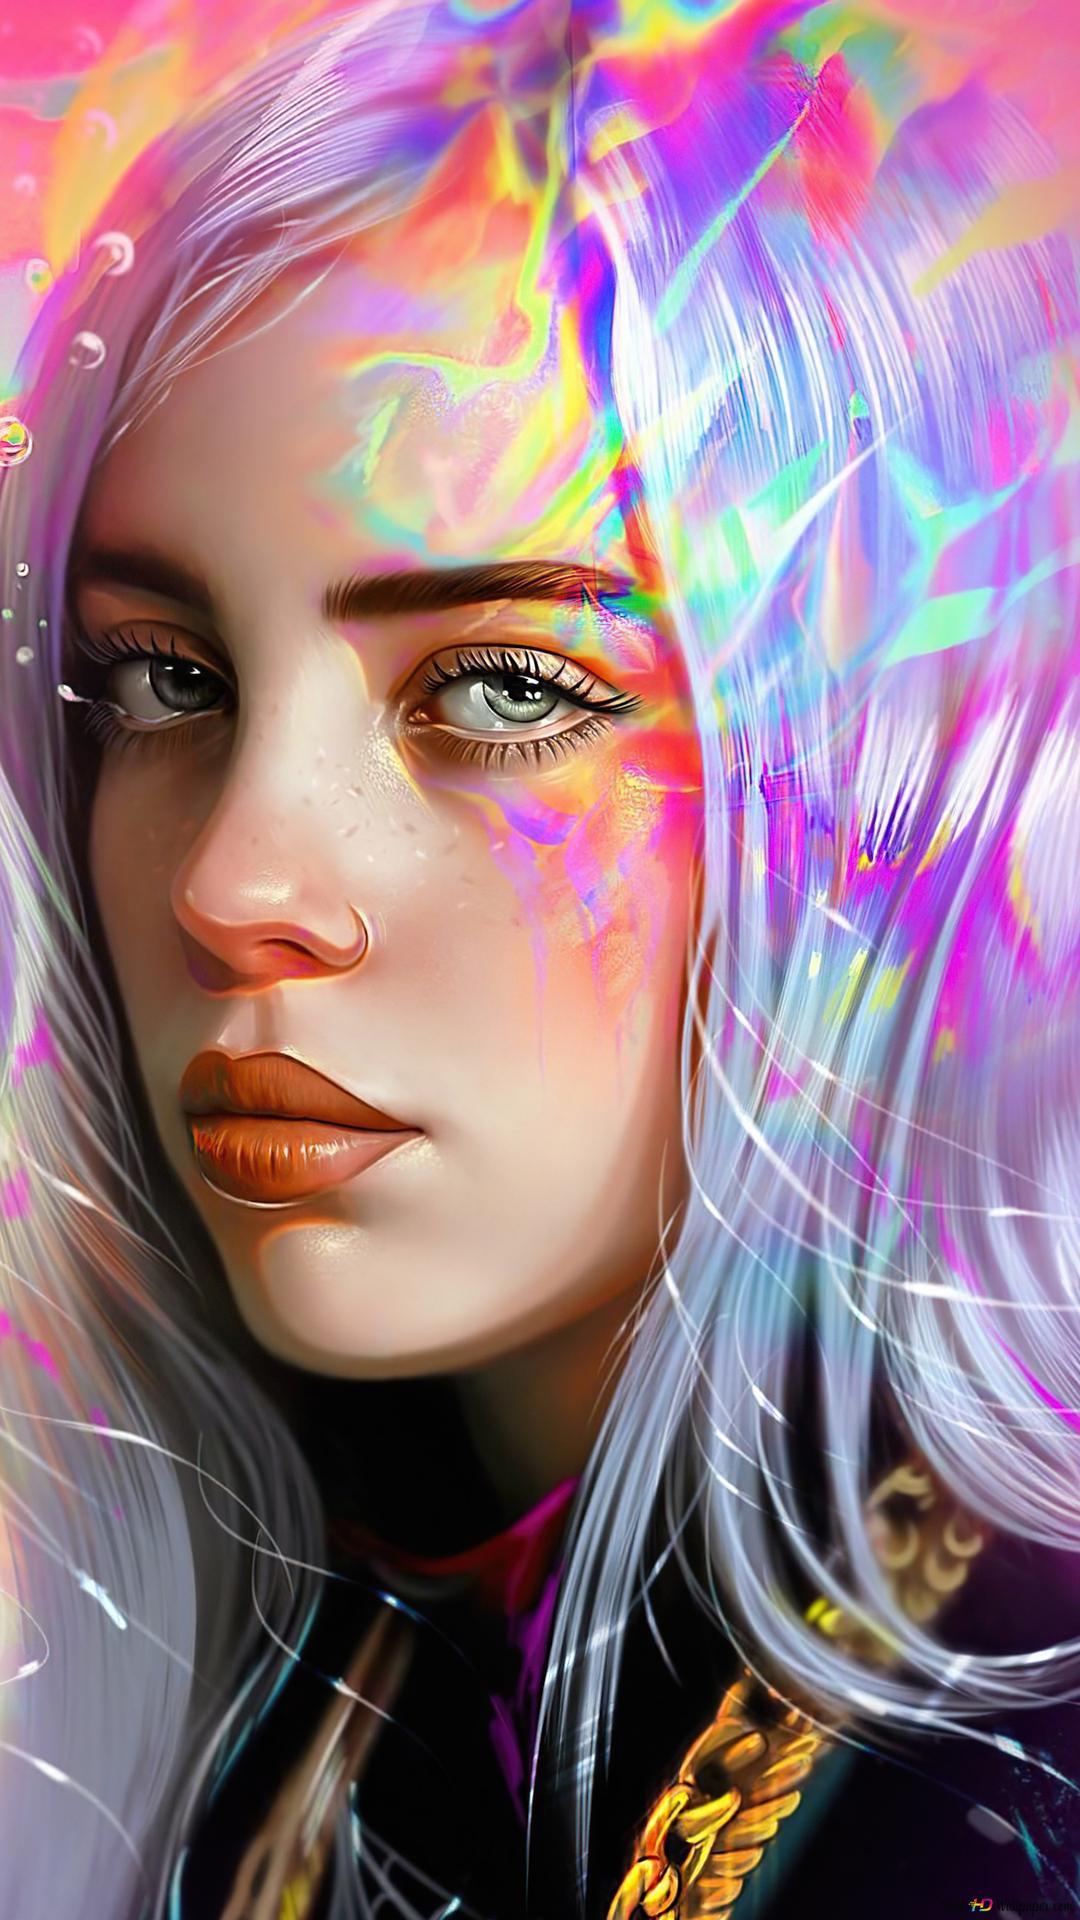 Billie Eilish Art Hd Wallpaper Download